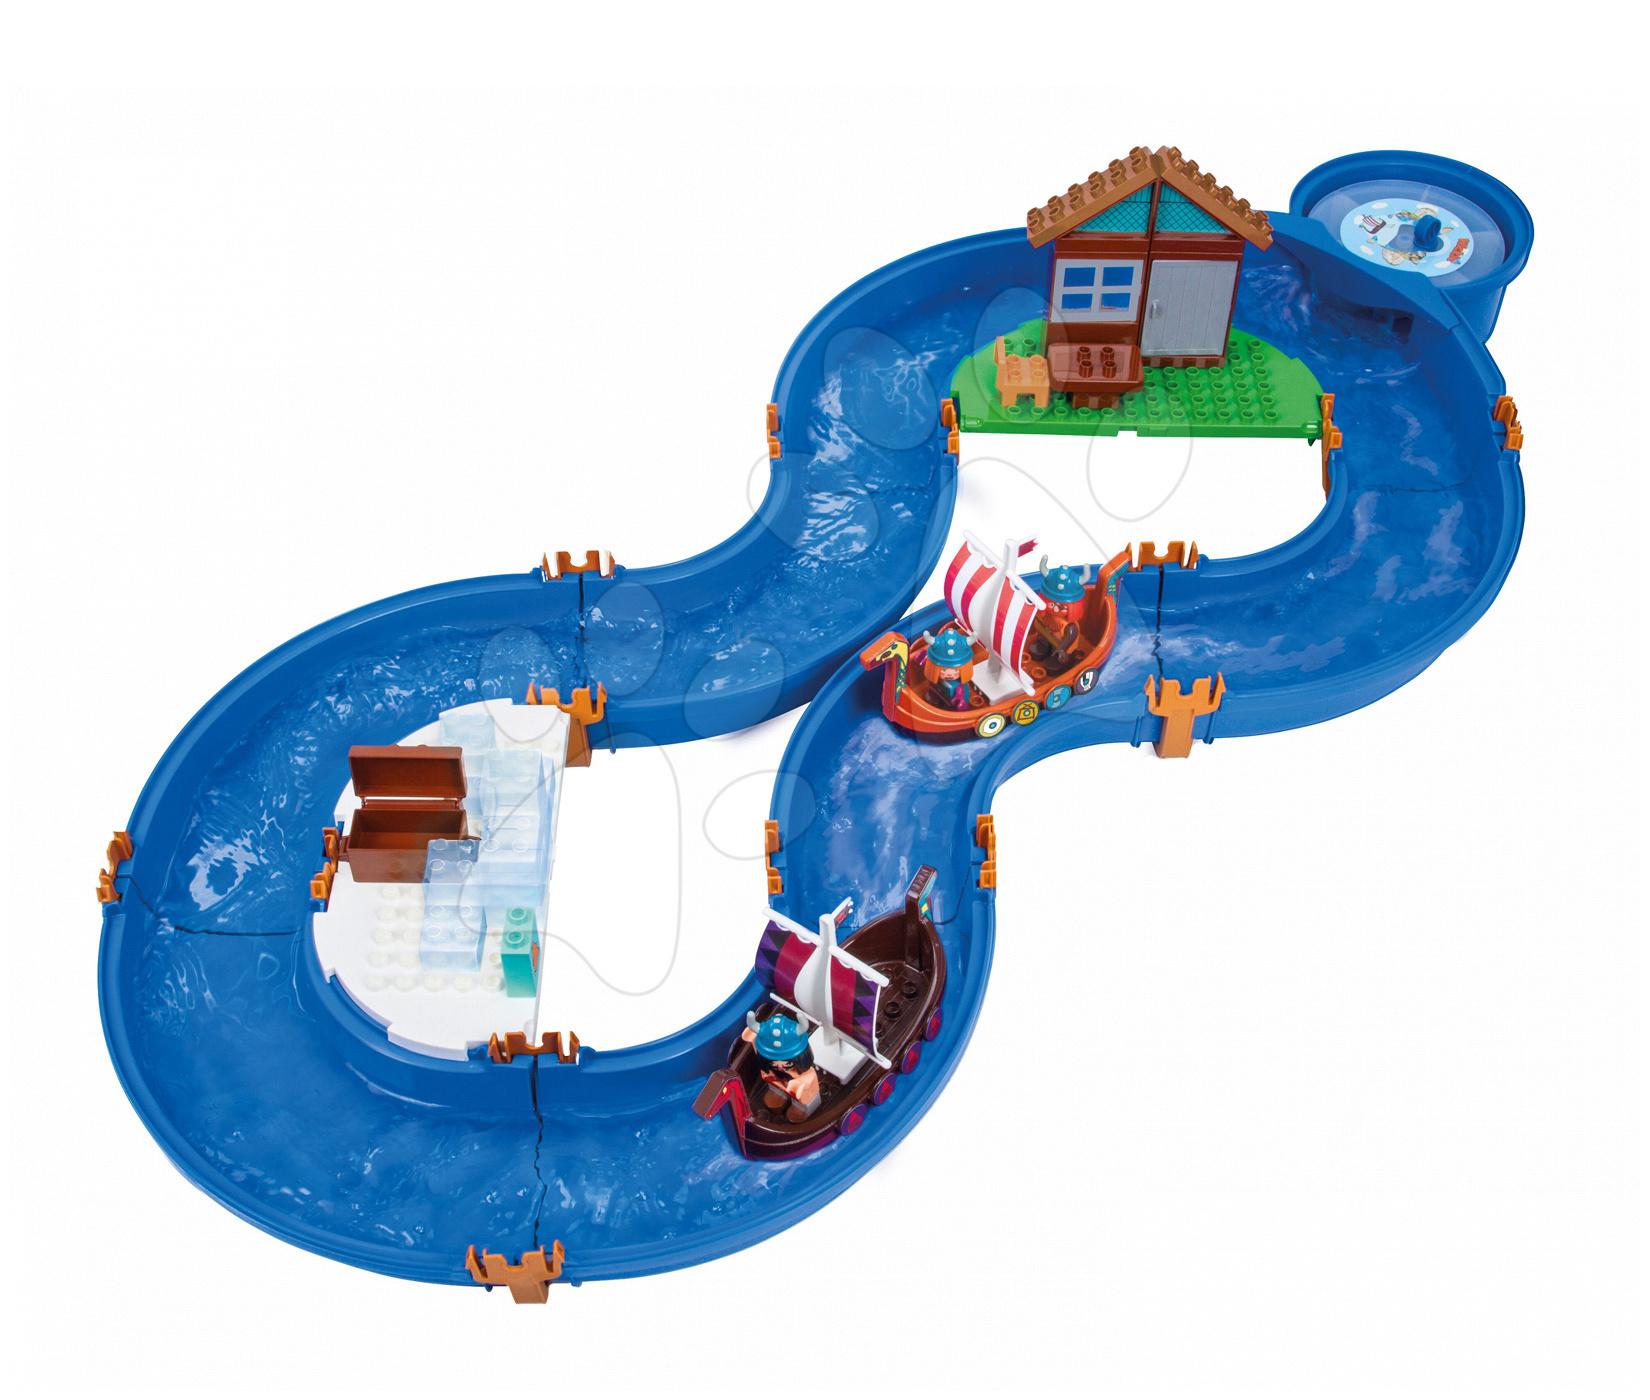 Vodní hra Waterplay Vikingové Grónsko BIG skládací s figurkami modrá